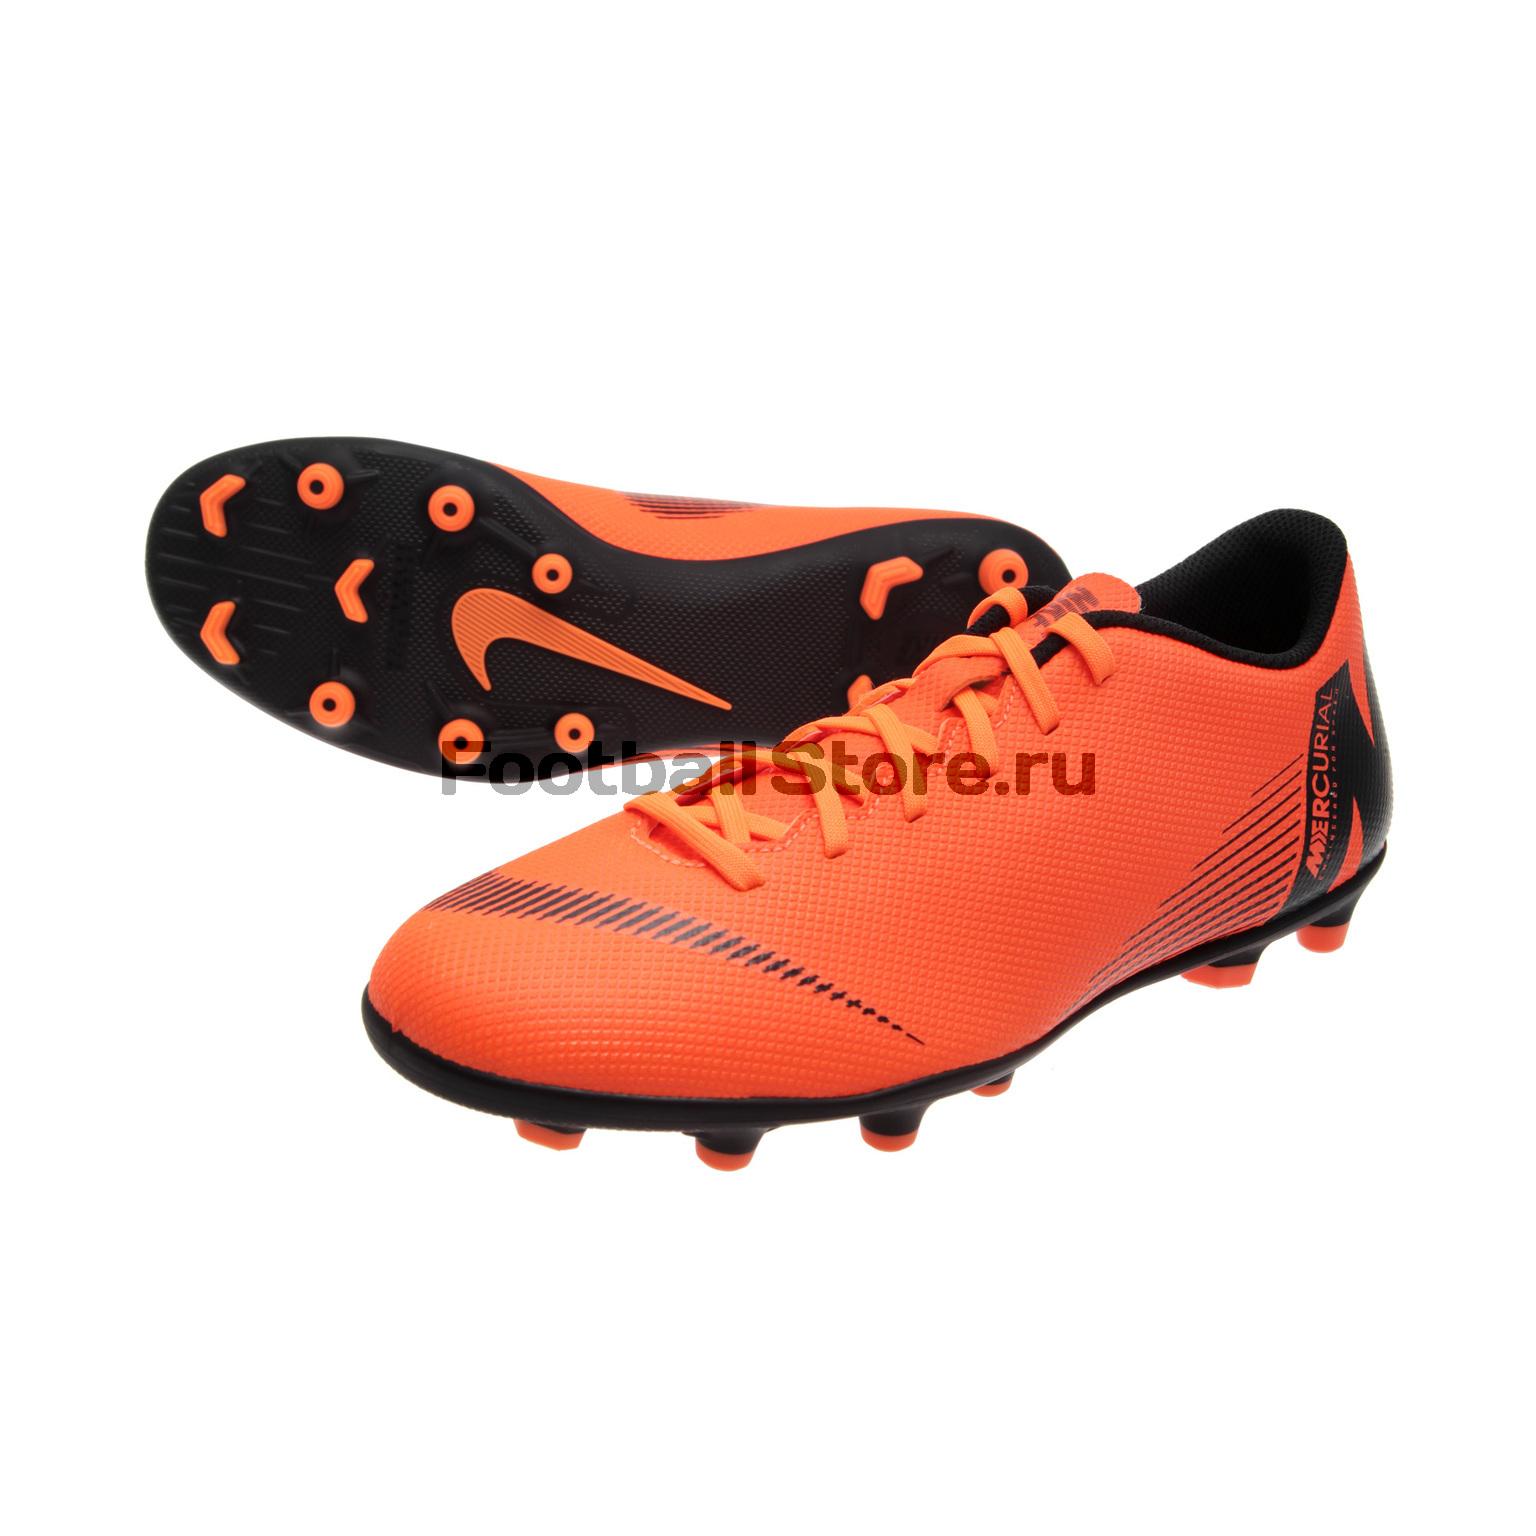 Бутсы Nike Vapor 12 Club FG/MG AH7378-810 бутсы футбольные nike vapor xii elite fg ah7380 081 sr черн оранж